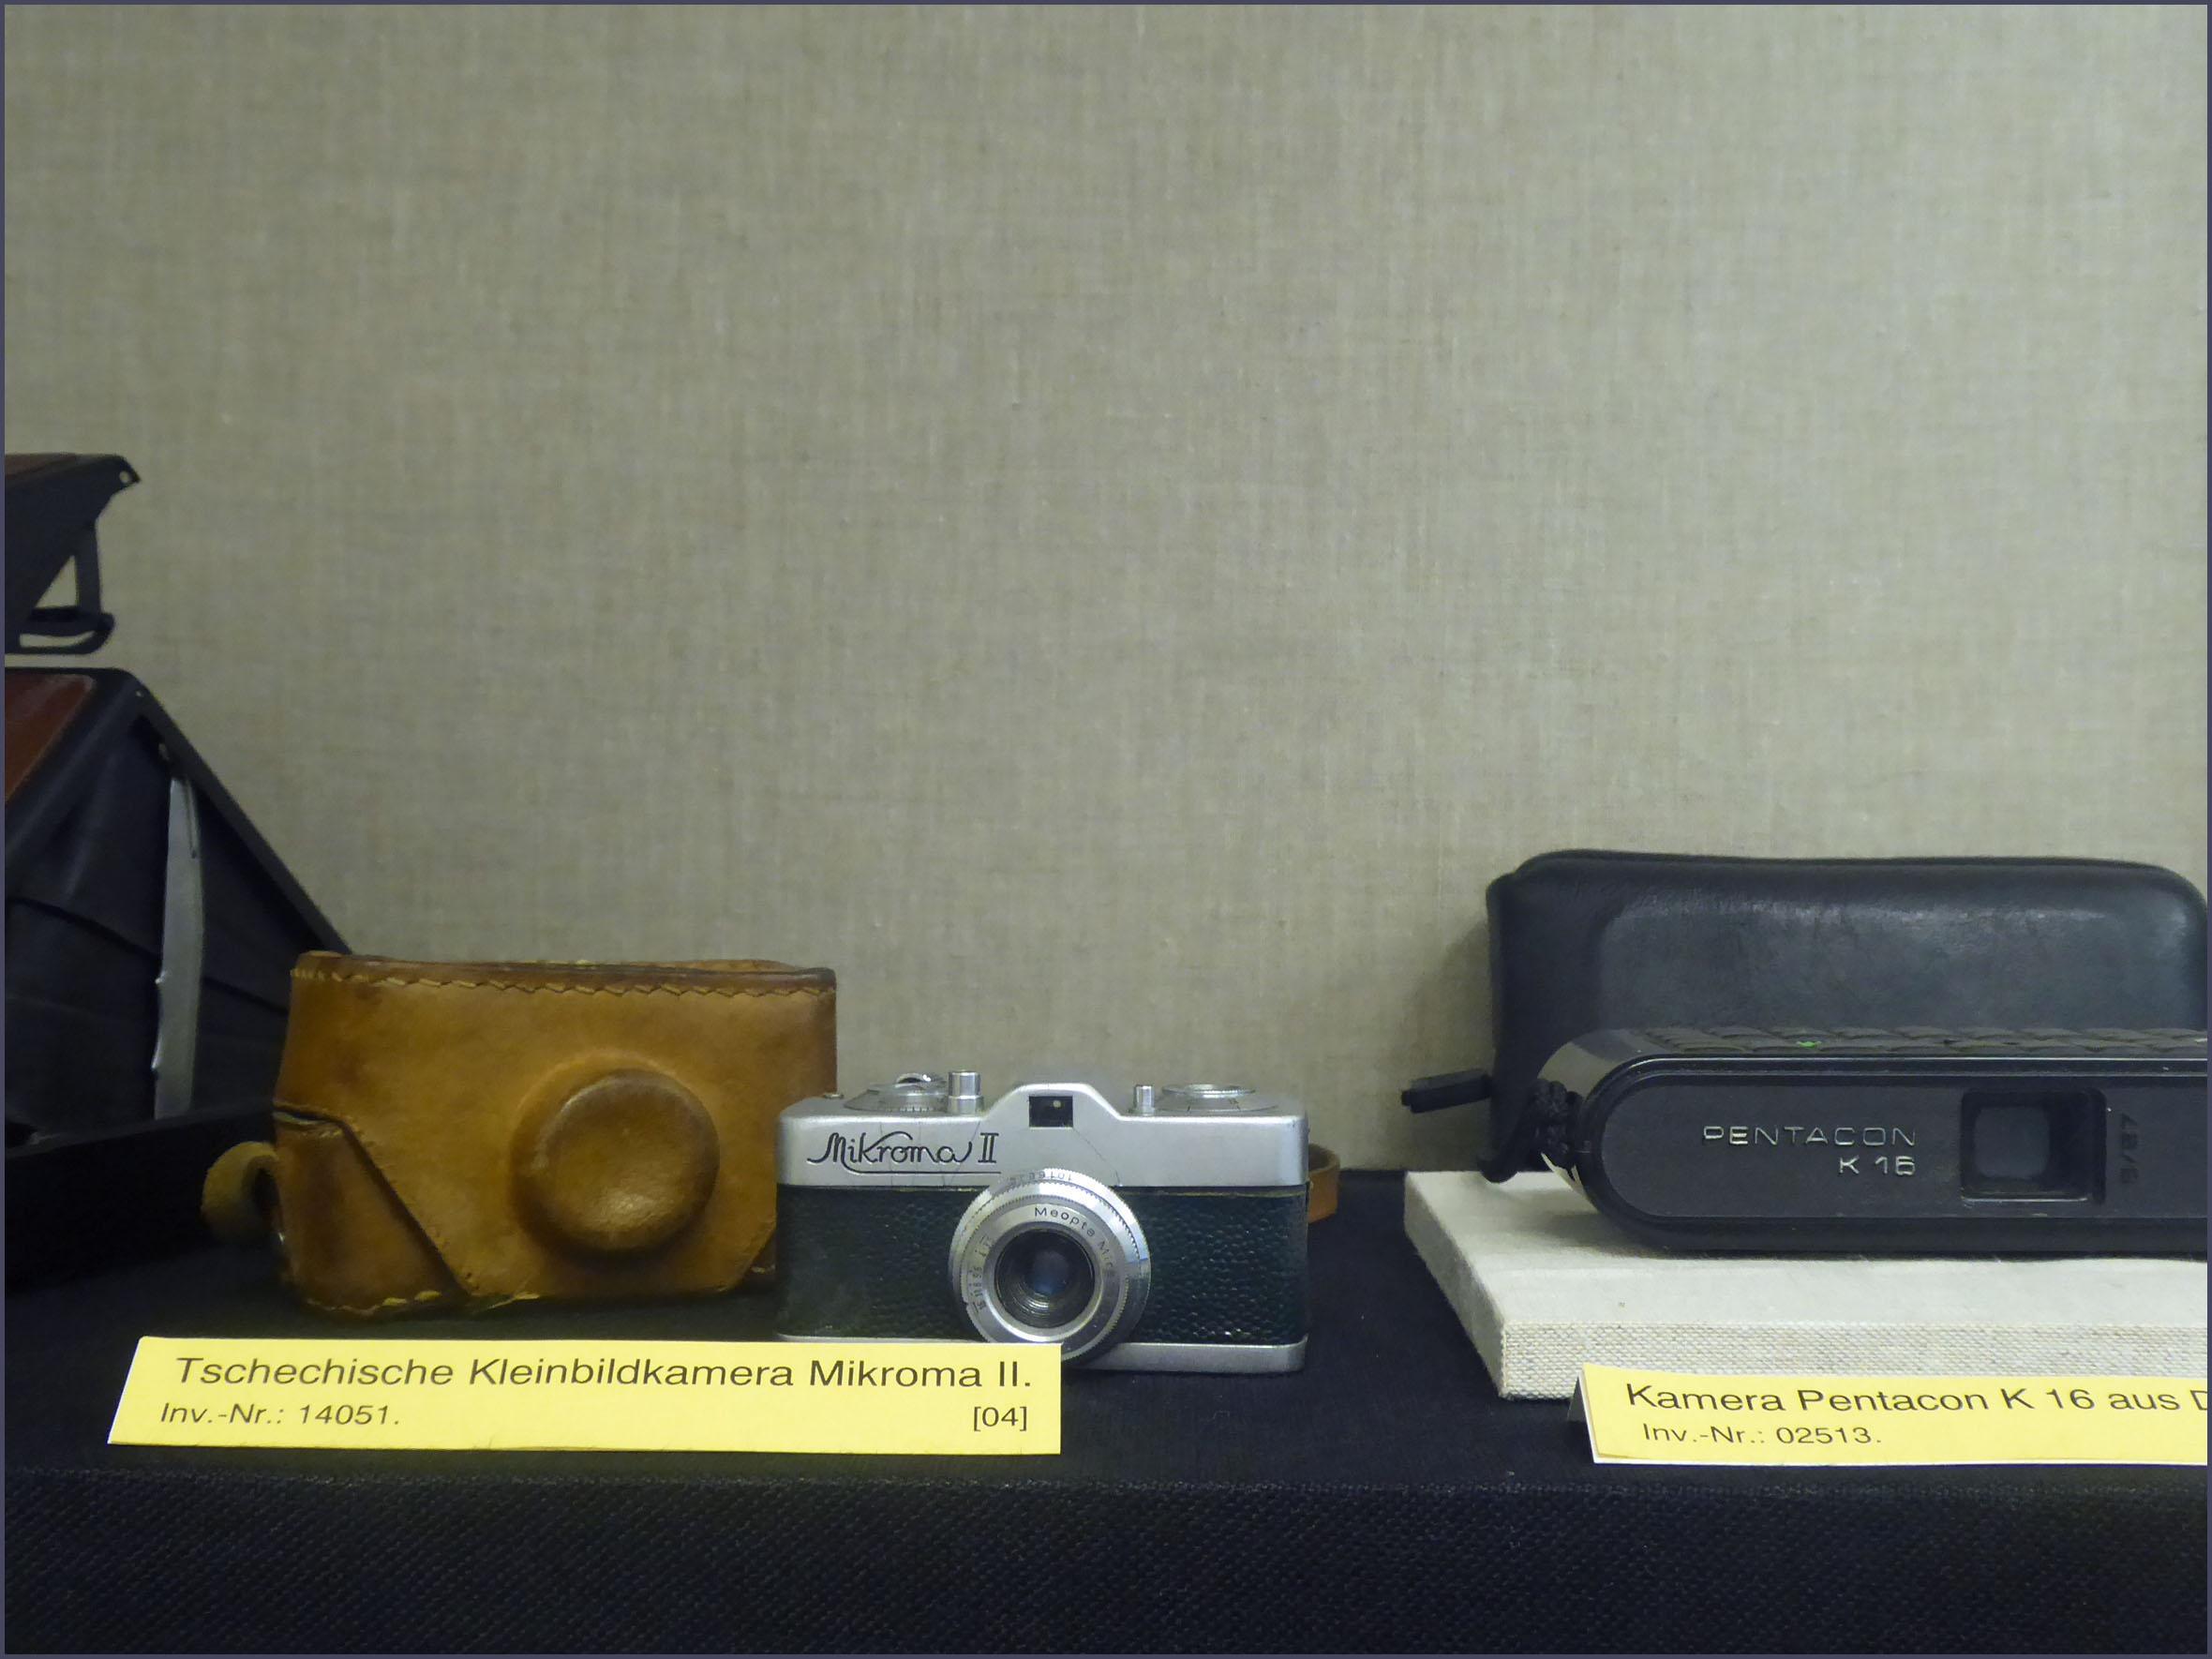 Display of tiny cameras